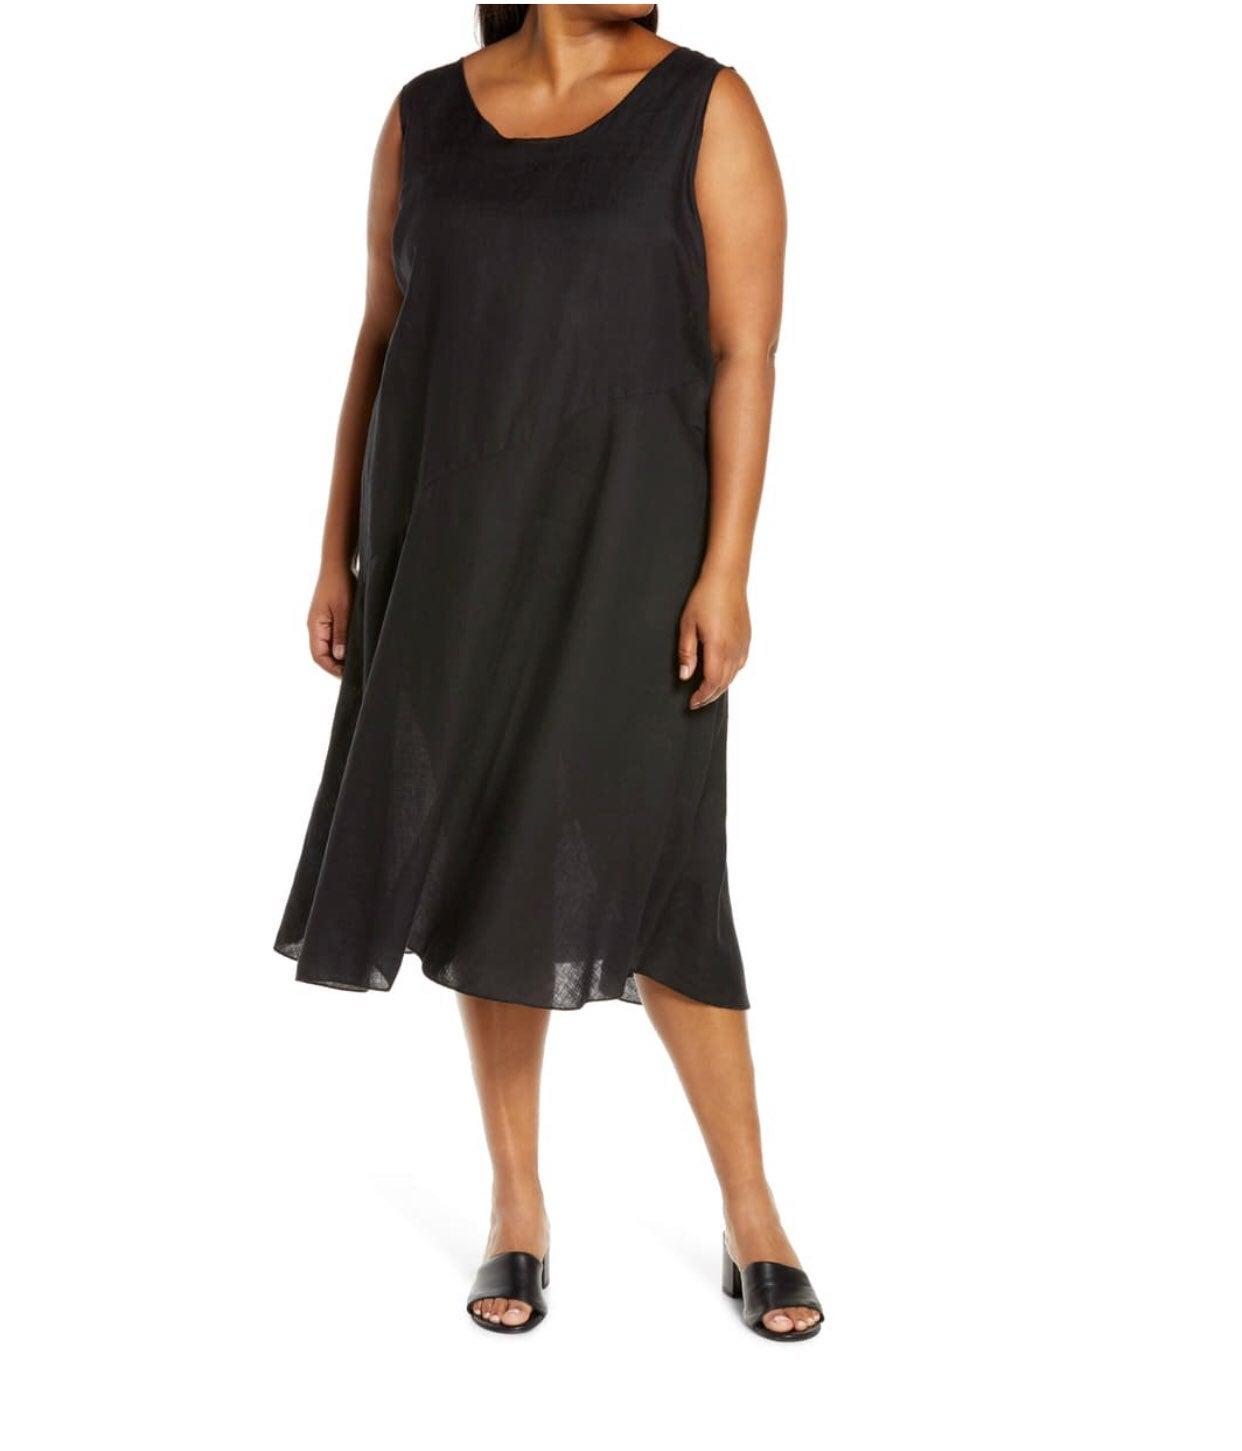 Eileen fisher linen midi dress sz M